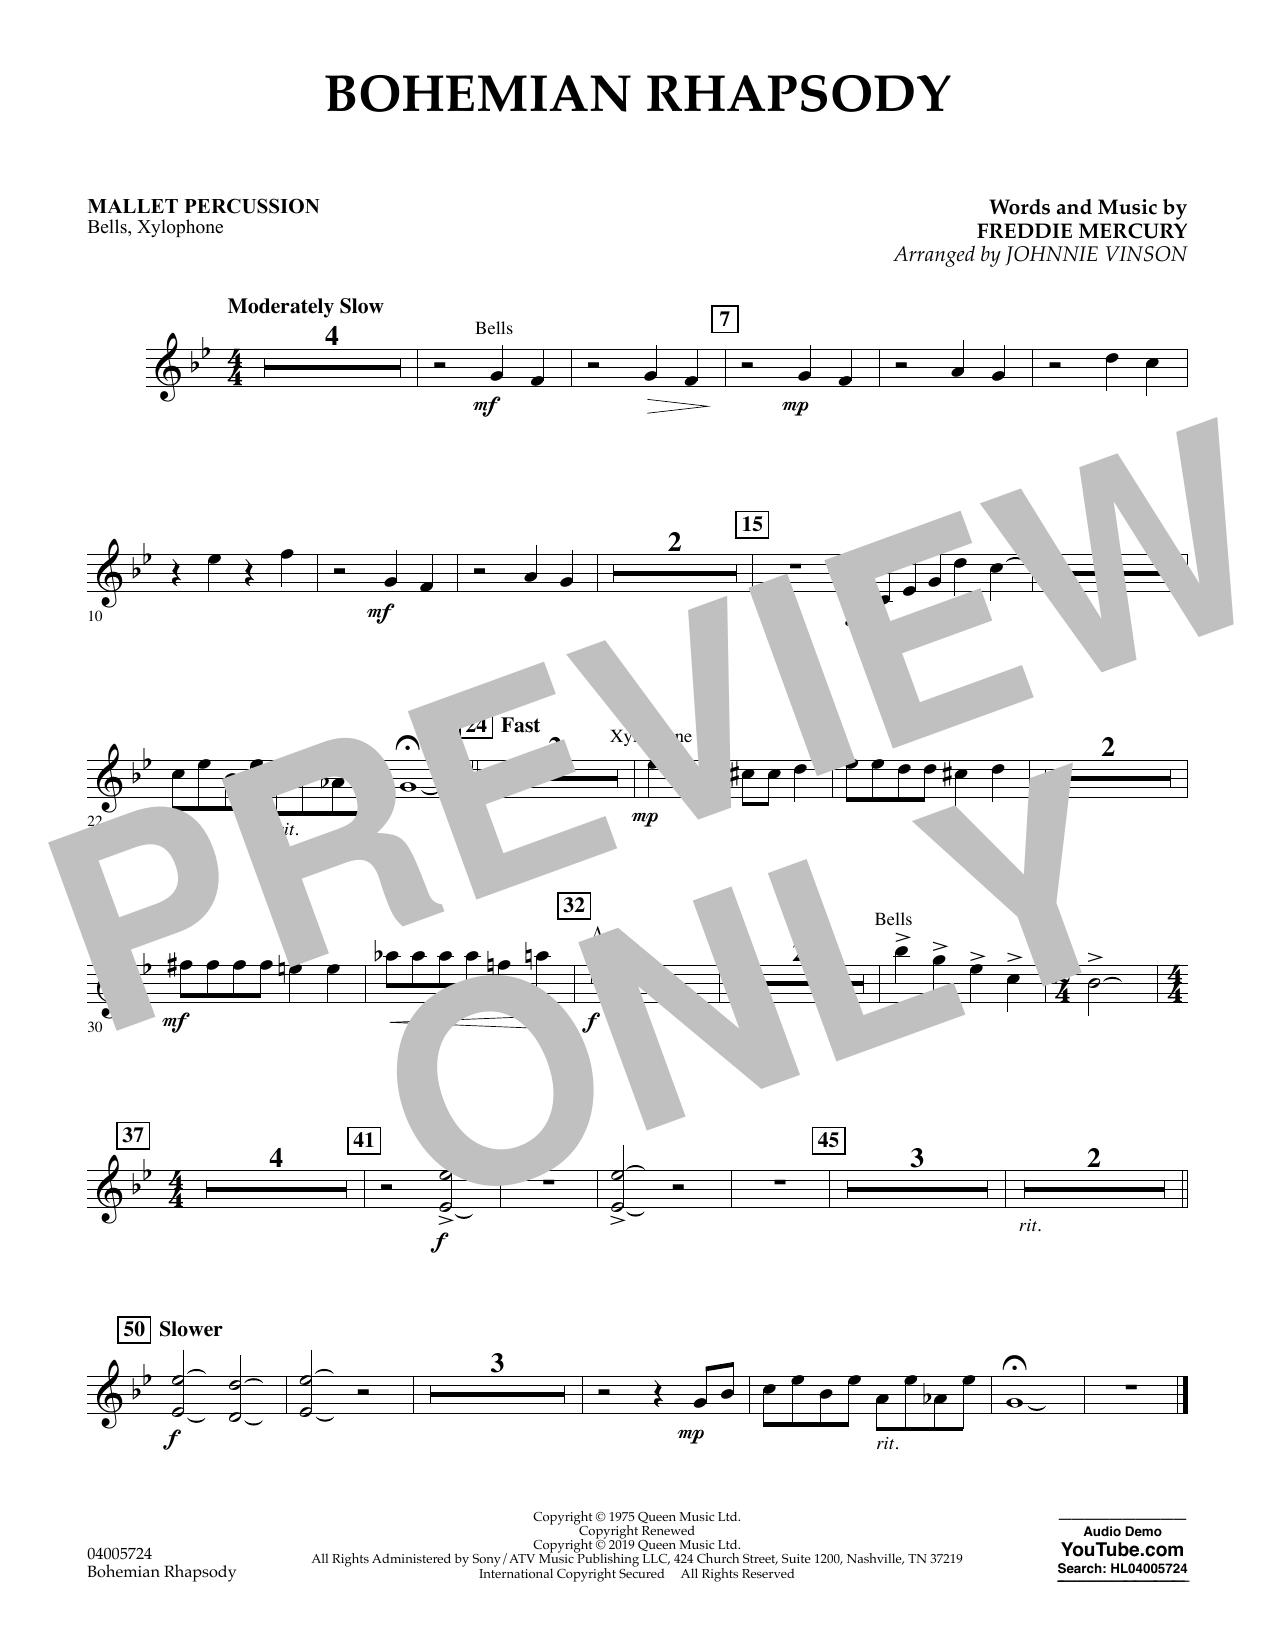 Bohemian Rhapsody (arr. Johnnie Vinson) - Mallet Percussion (Concert Band)